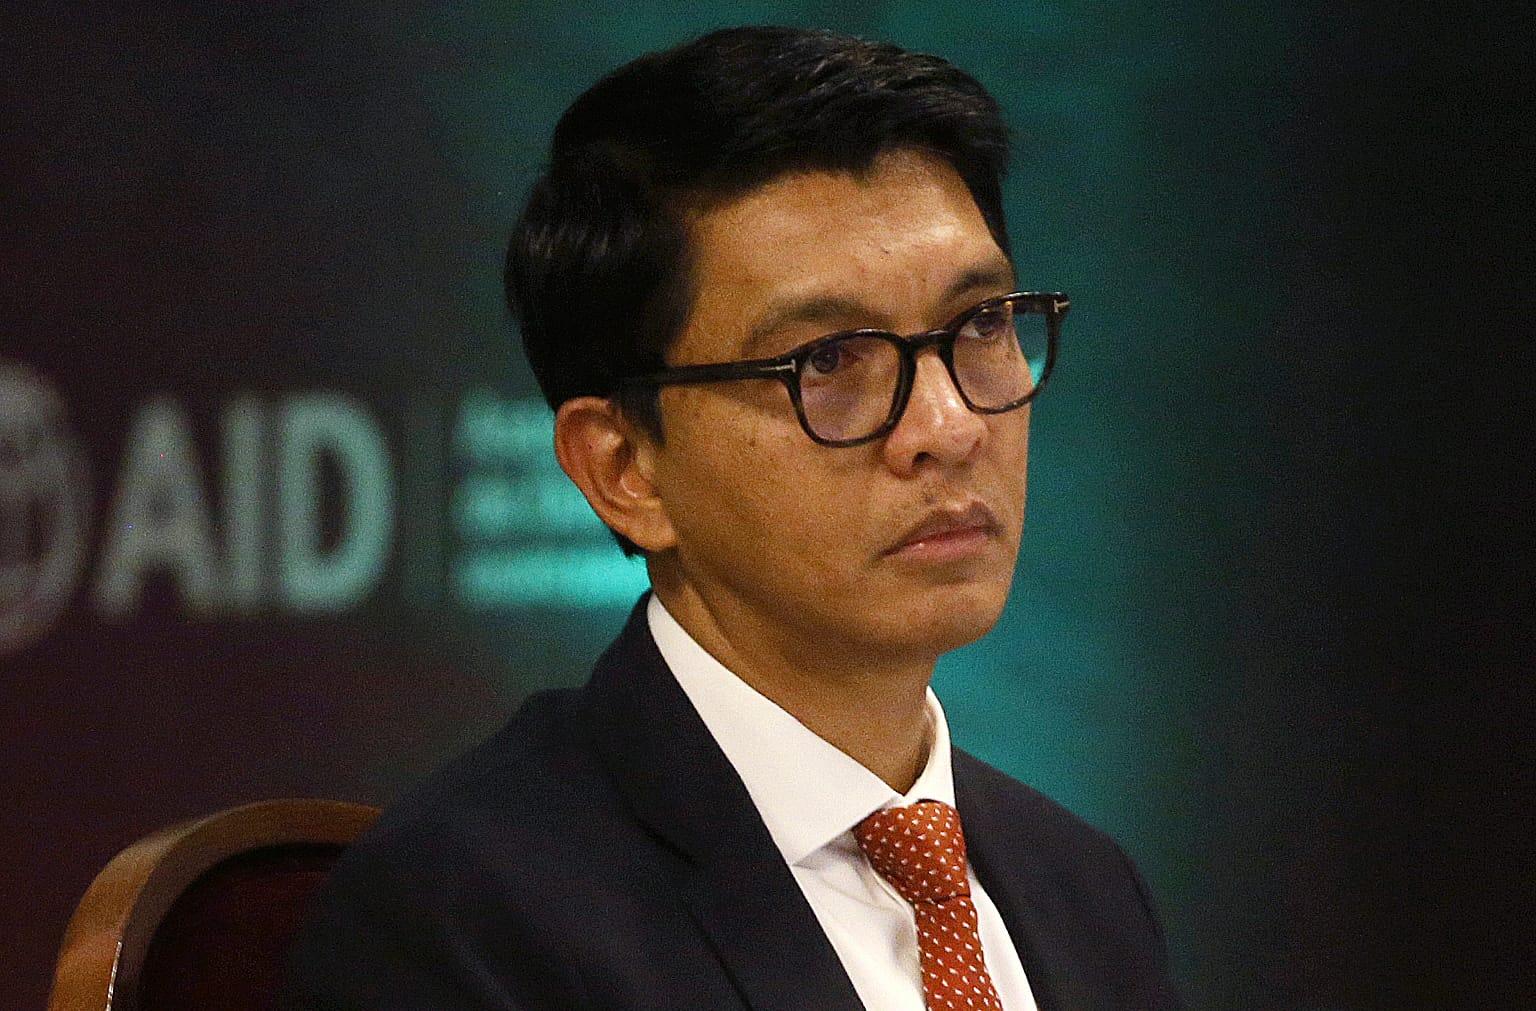 Madagaskarin presidentti Andry Rajoelina.